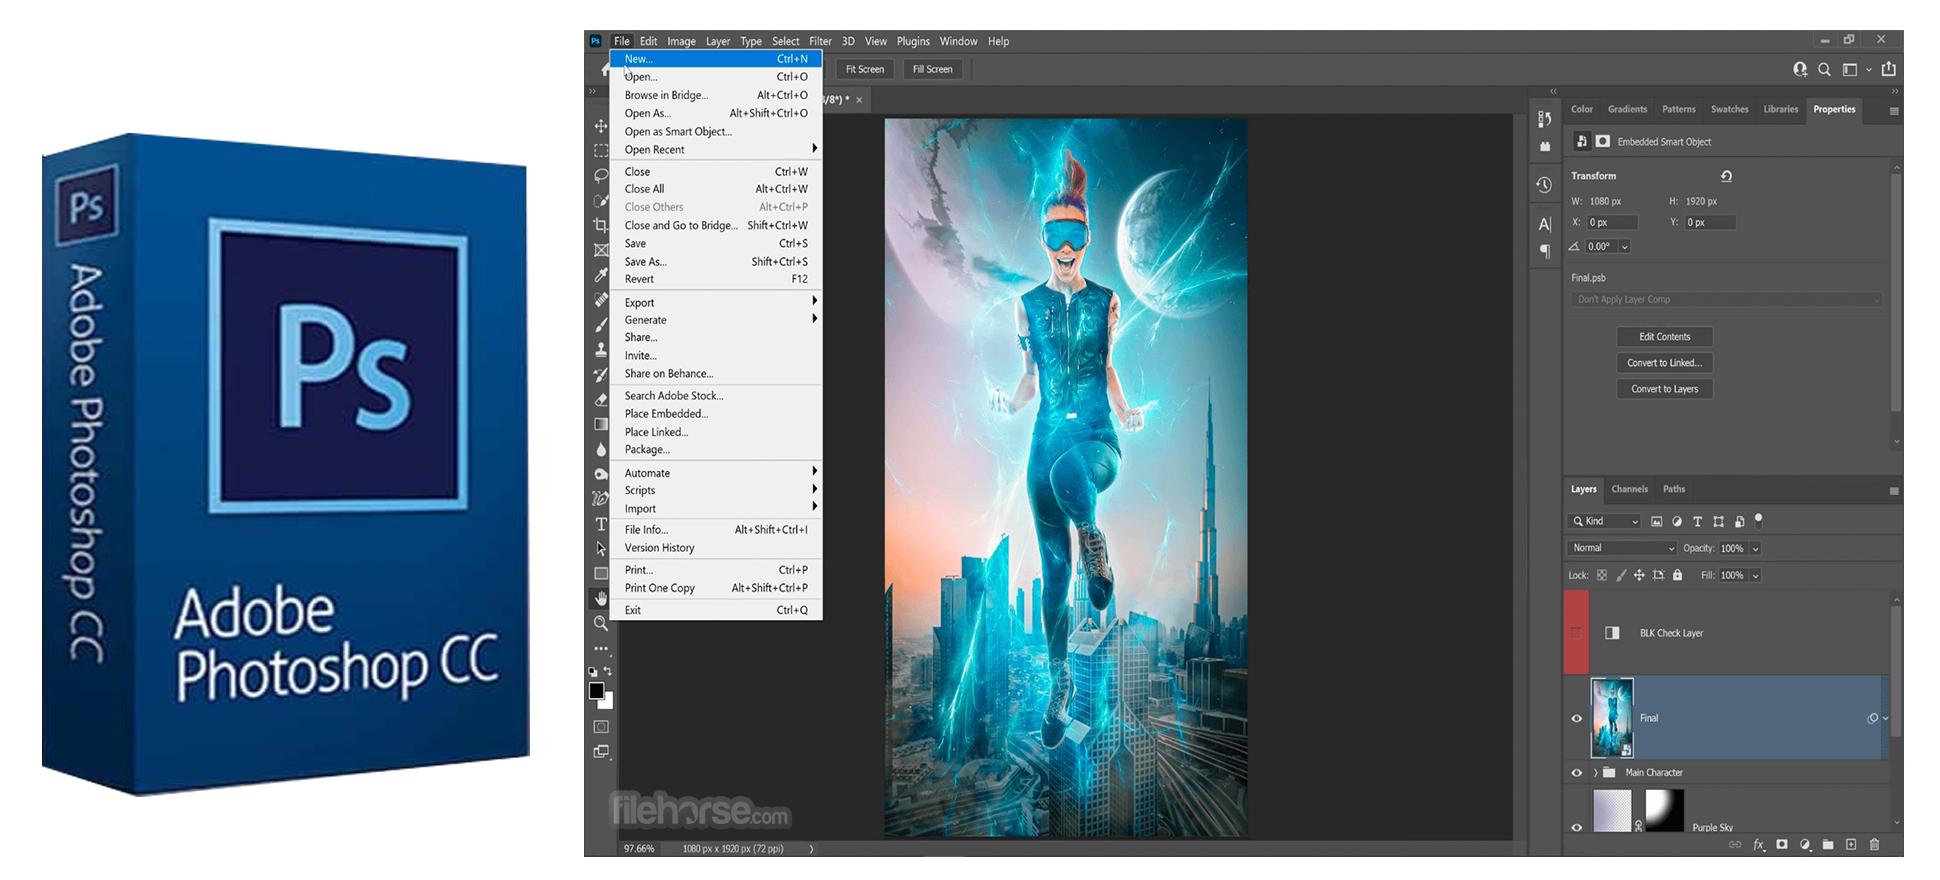 Cara Install Adobe Photoshop CC 2021